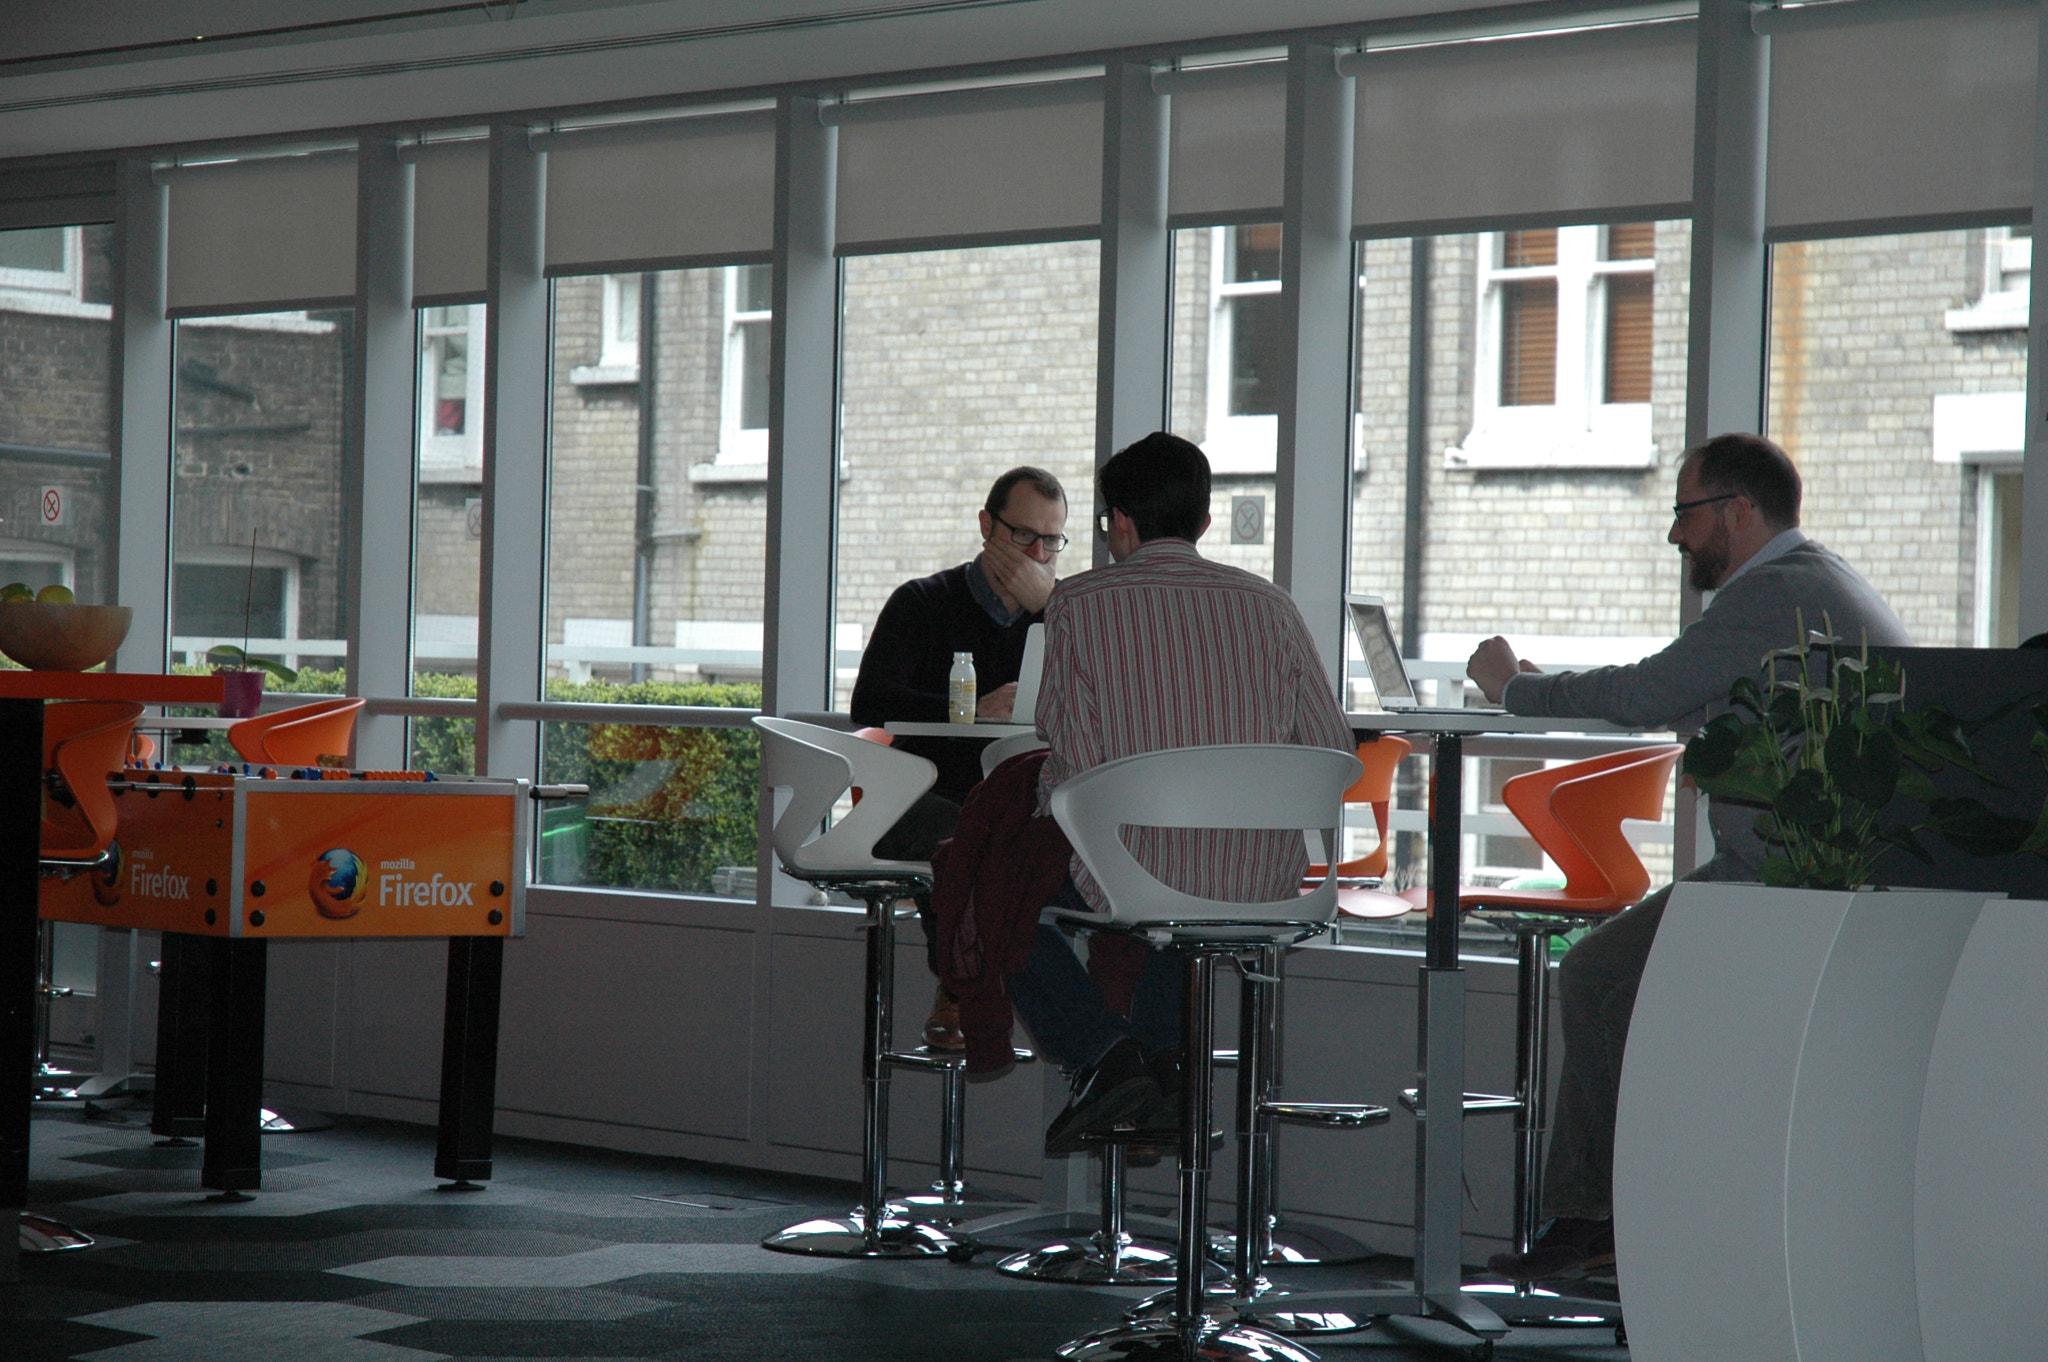 File:Inside Mozilla London Community Space (66157661) jpeg